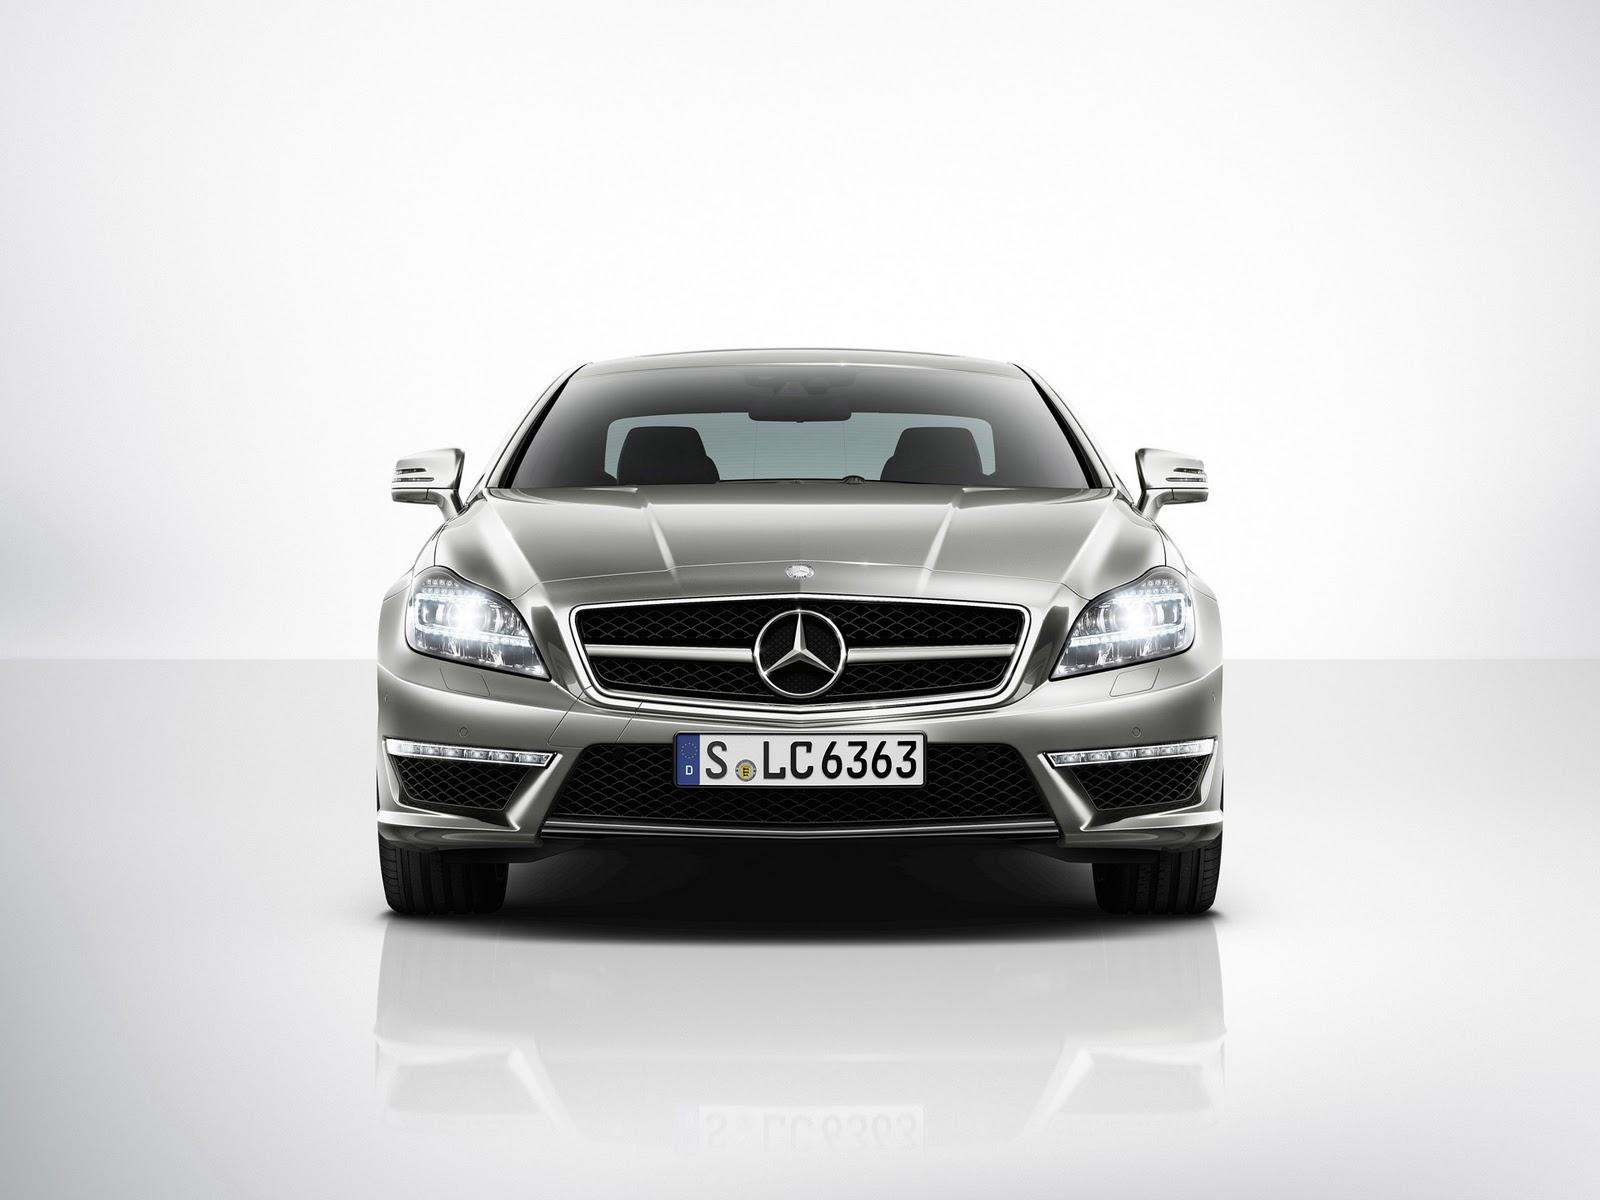 http://3.bp.blogspot.com/_viCh1SFyGrA/TO1x38_9pgI/AAAAAAAAAJw/TpsL5hg9xeg/s1600/2011-Mercedes-Benz-CLS-63-AMG-Studio-Front-1920x1440.jpg